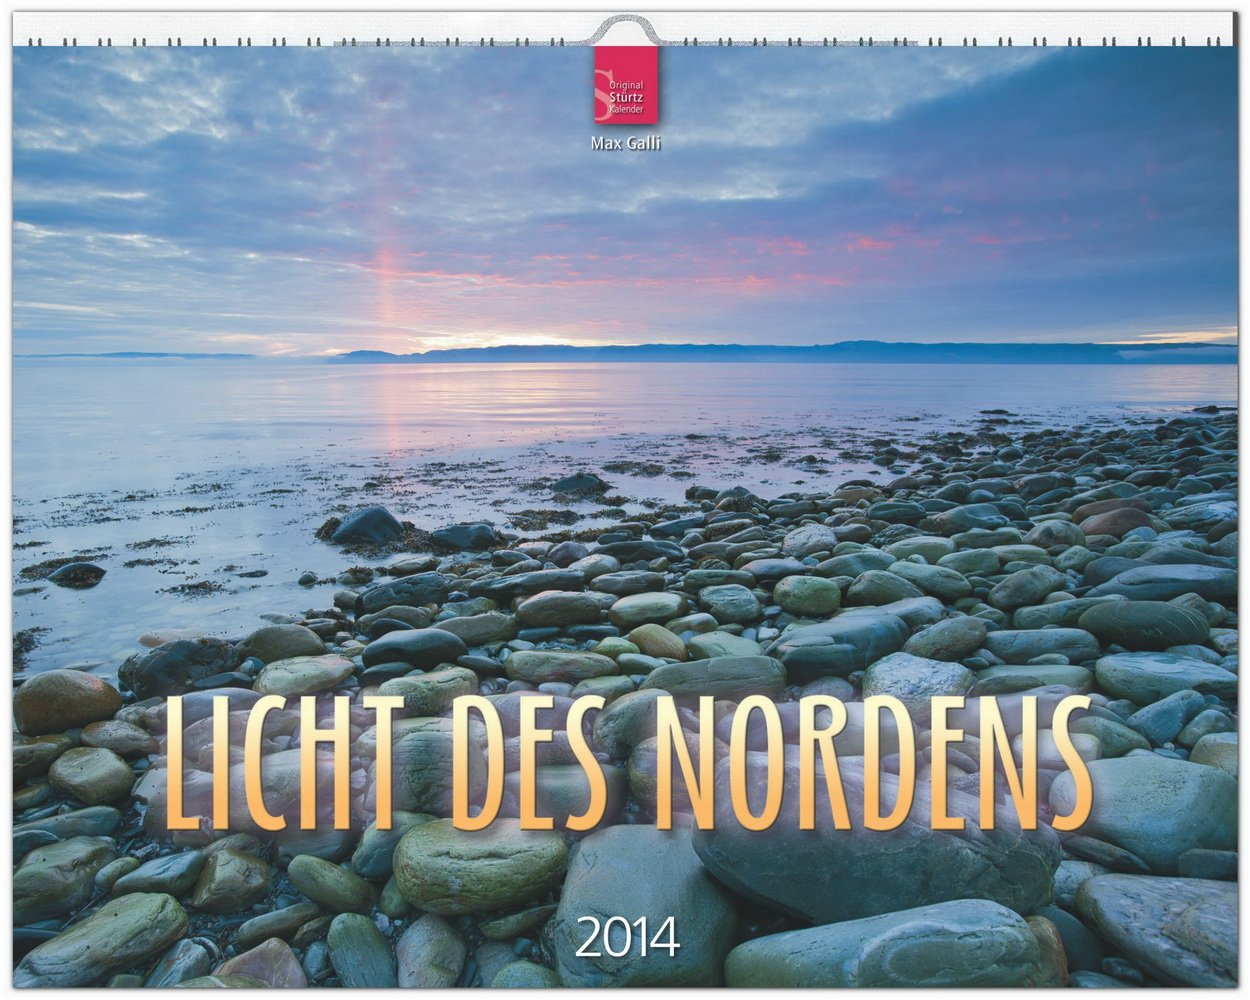 Licht des Nordens 2014: Original Stürtz-Kalender - Großformat-Kalender 60 x 48 cm [Spiralbindung]